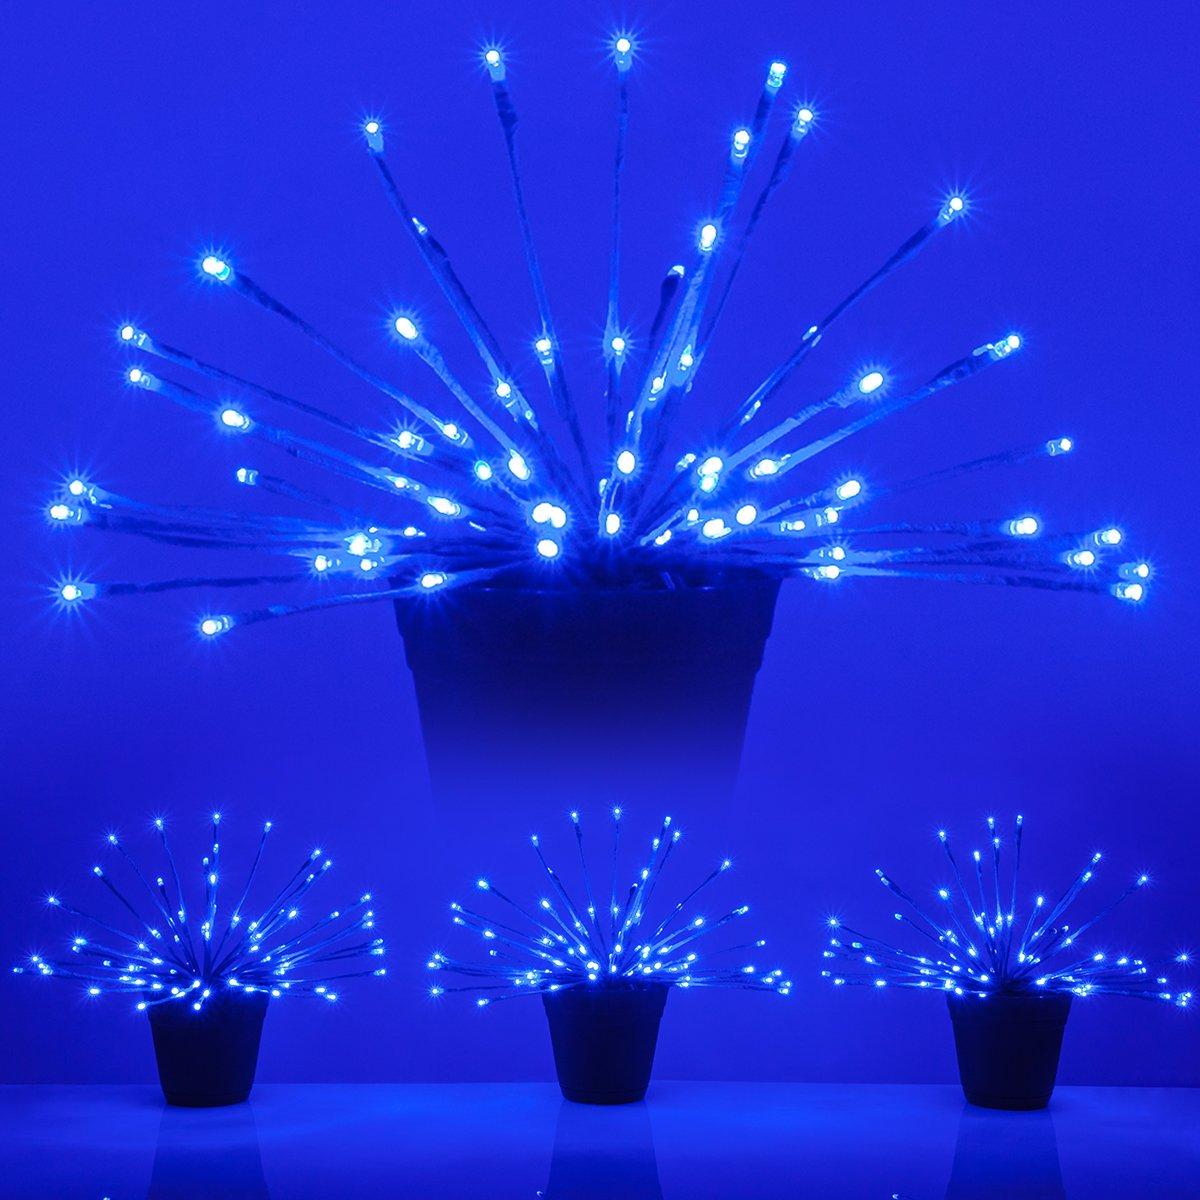 LED Starburst 5mm Light Balls - Fairy Lights - Lighted Branches (15'', Blue Branches/Blue Twinkle Lights, Set of 3)